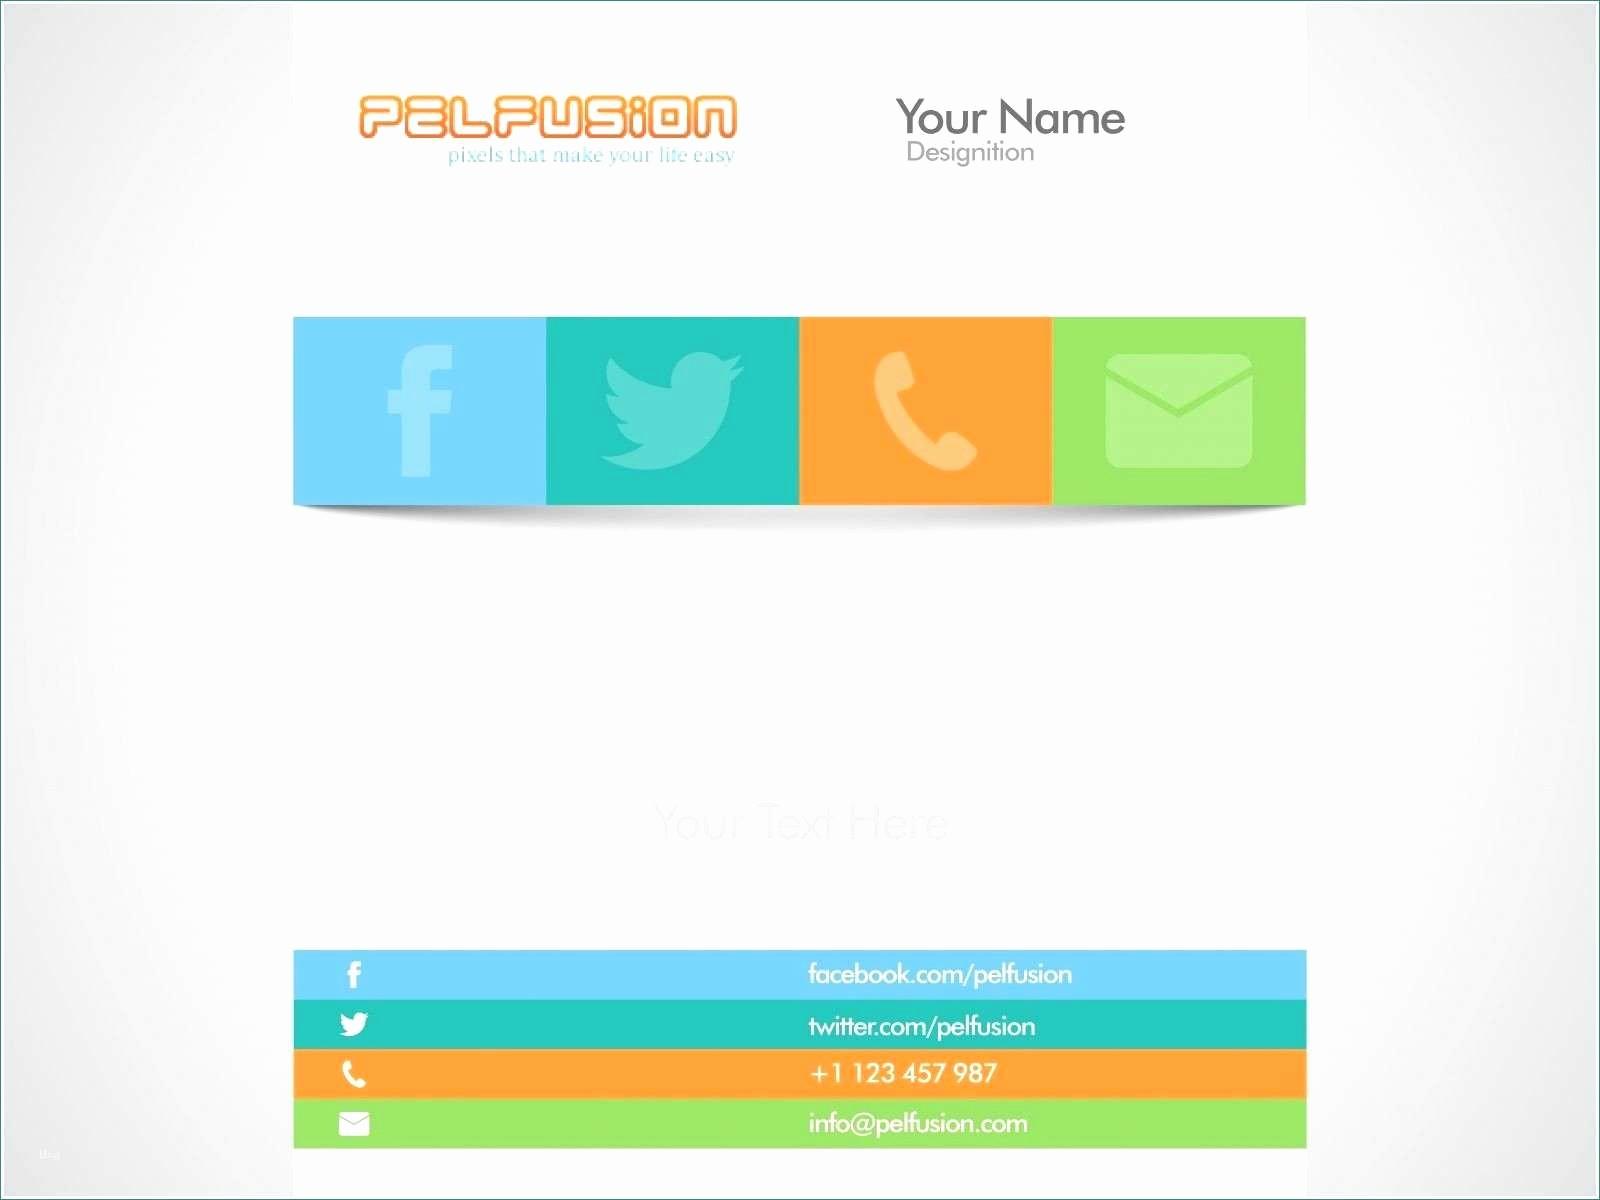 Microsoft Publisher Business Card Templates Inspirational Microsoft Publisher Business Card Templates Fantastic